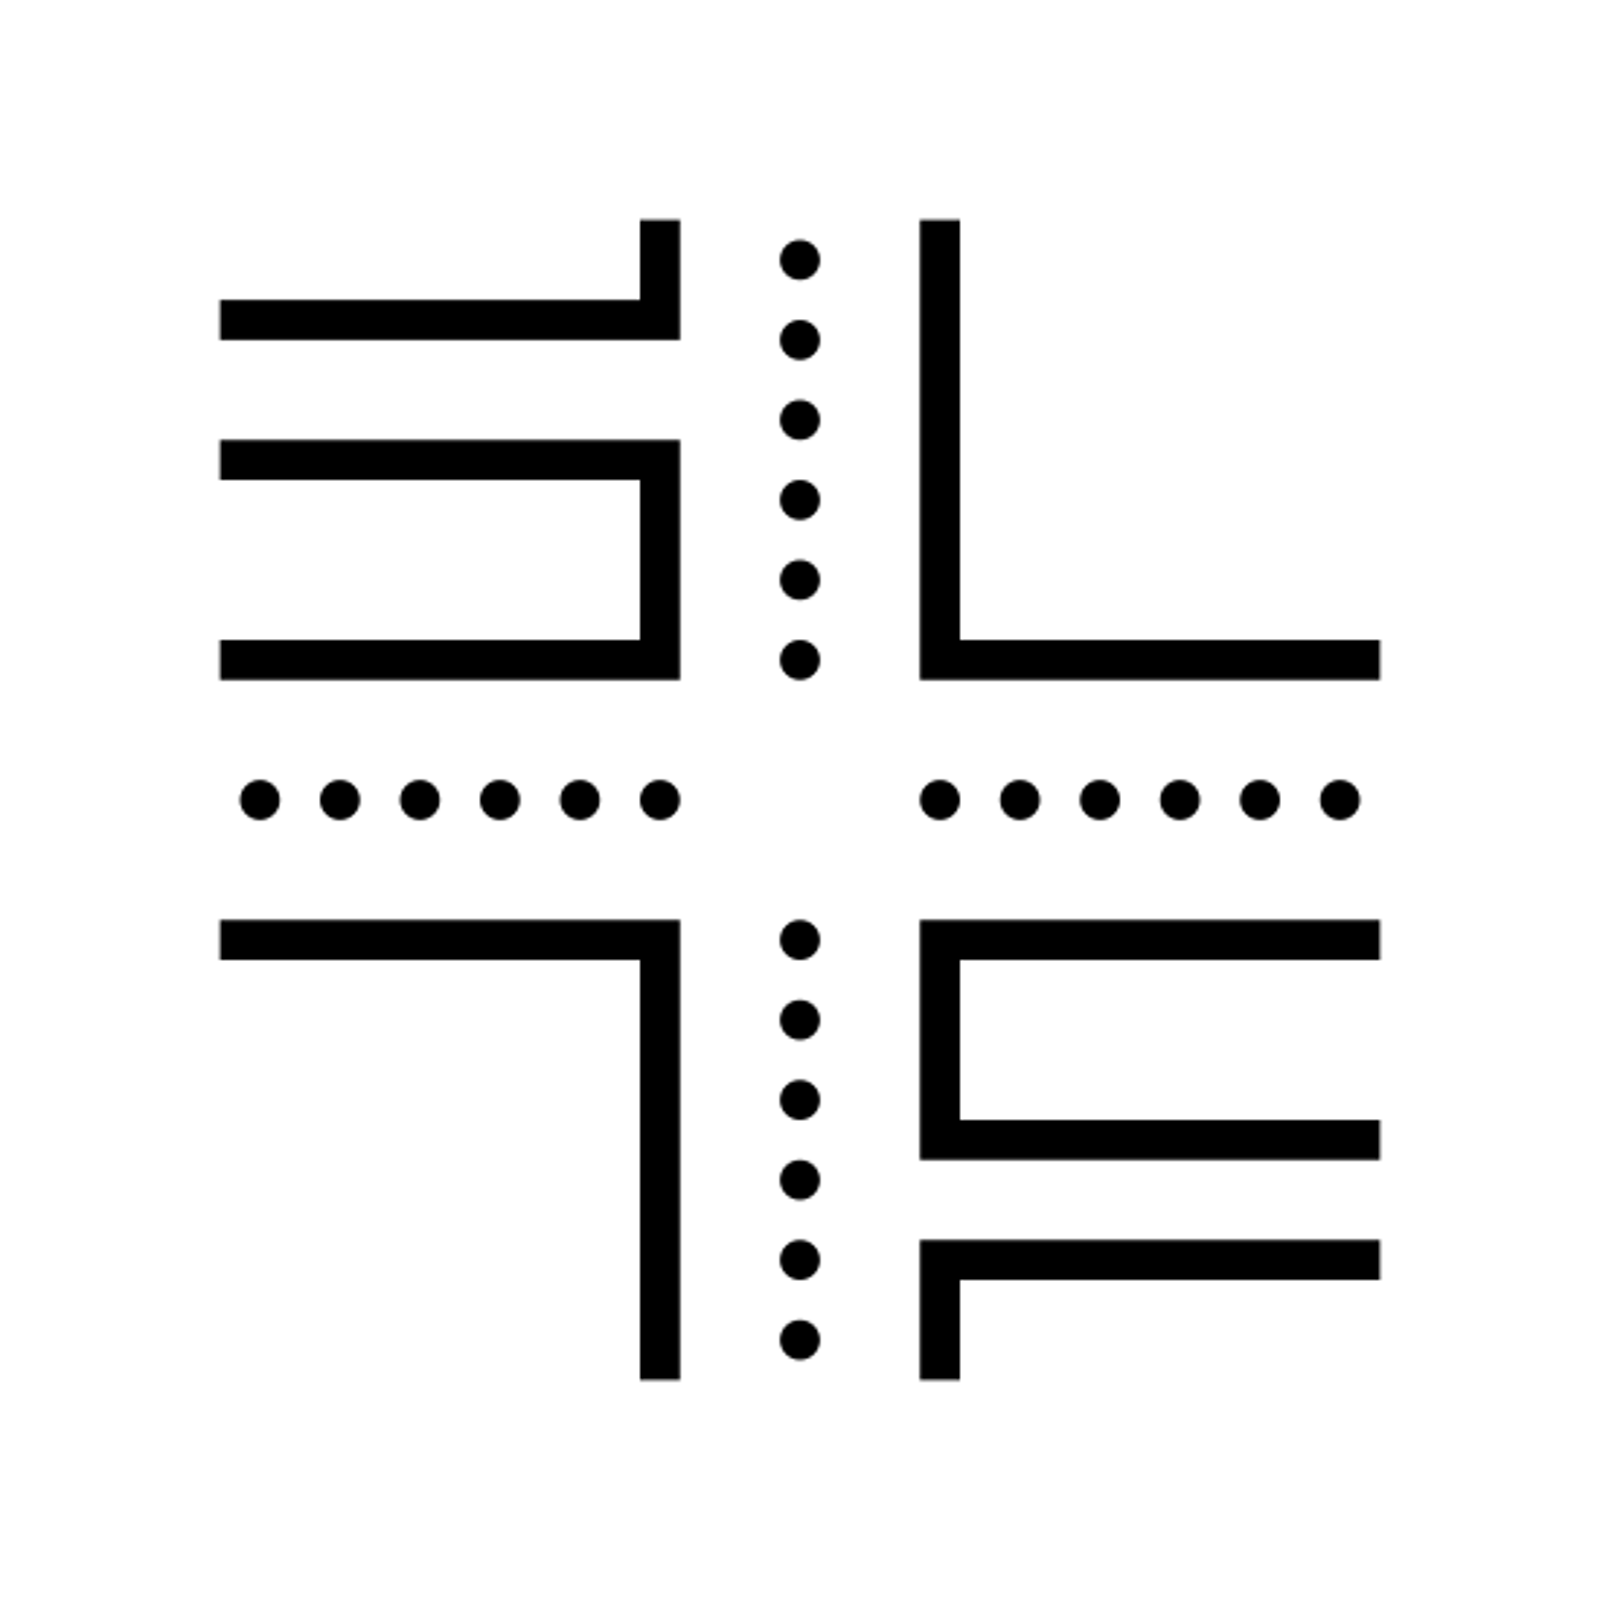 Streets icon